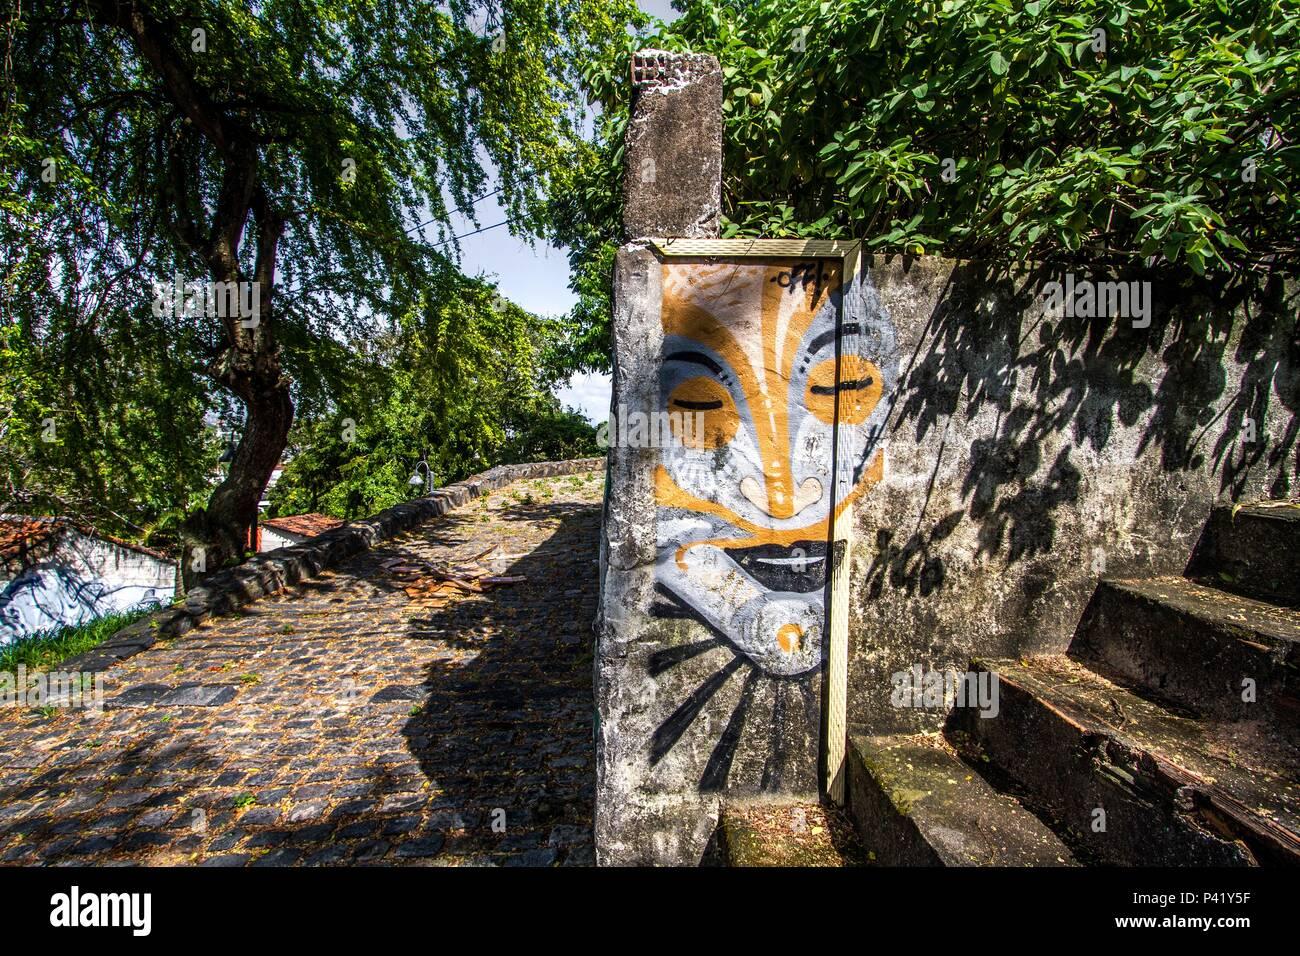 Olinda Pe Grafite Desenho Arte Escadas Rua De Olinda Muro